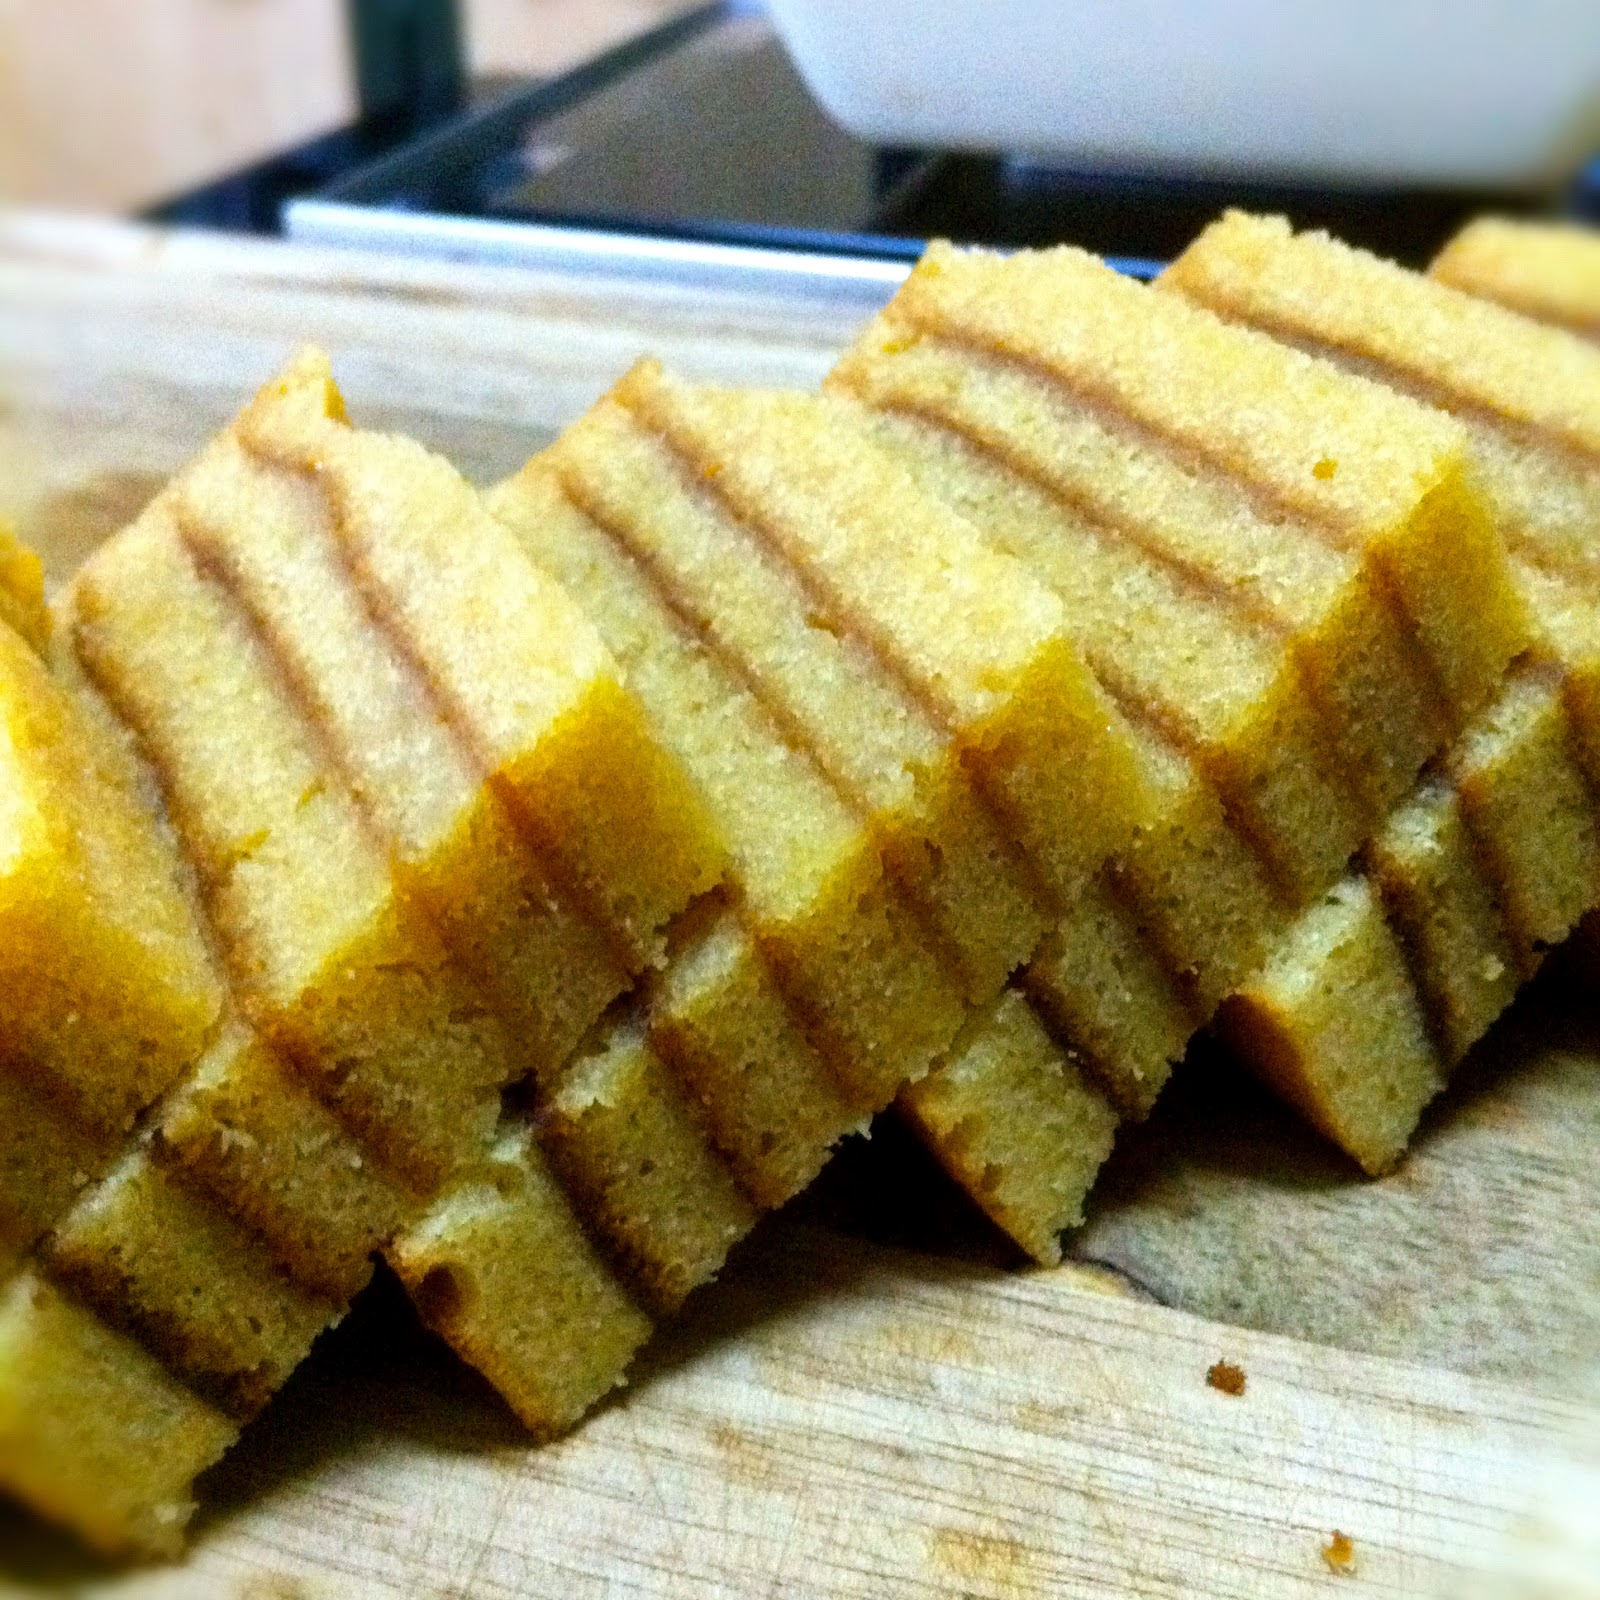 sarawak cake - photo #26